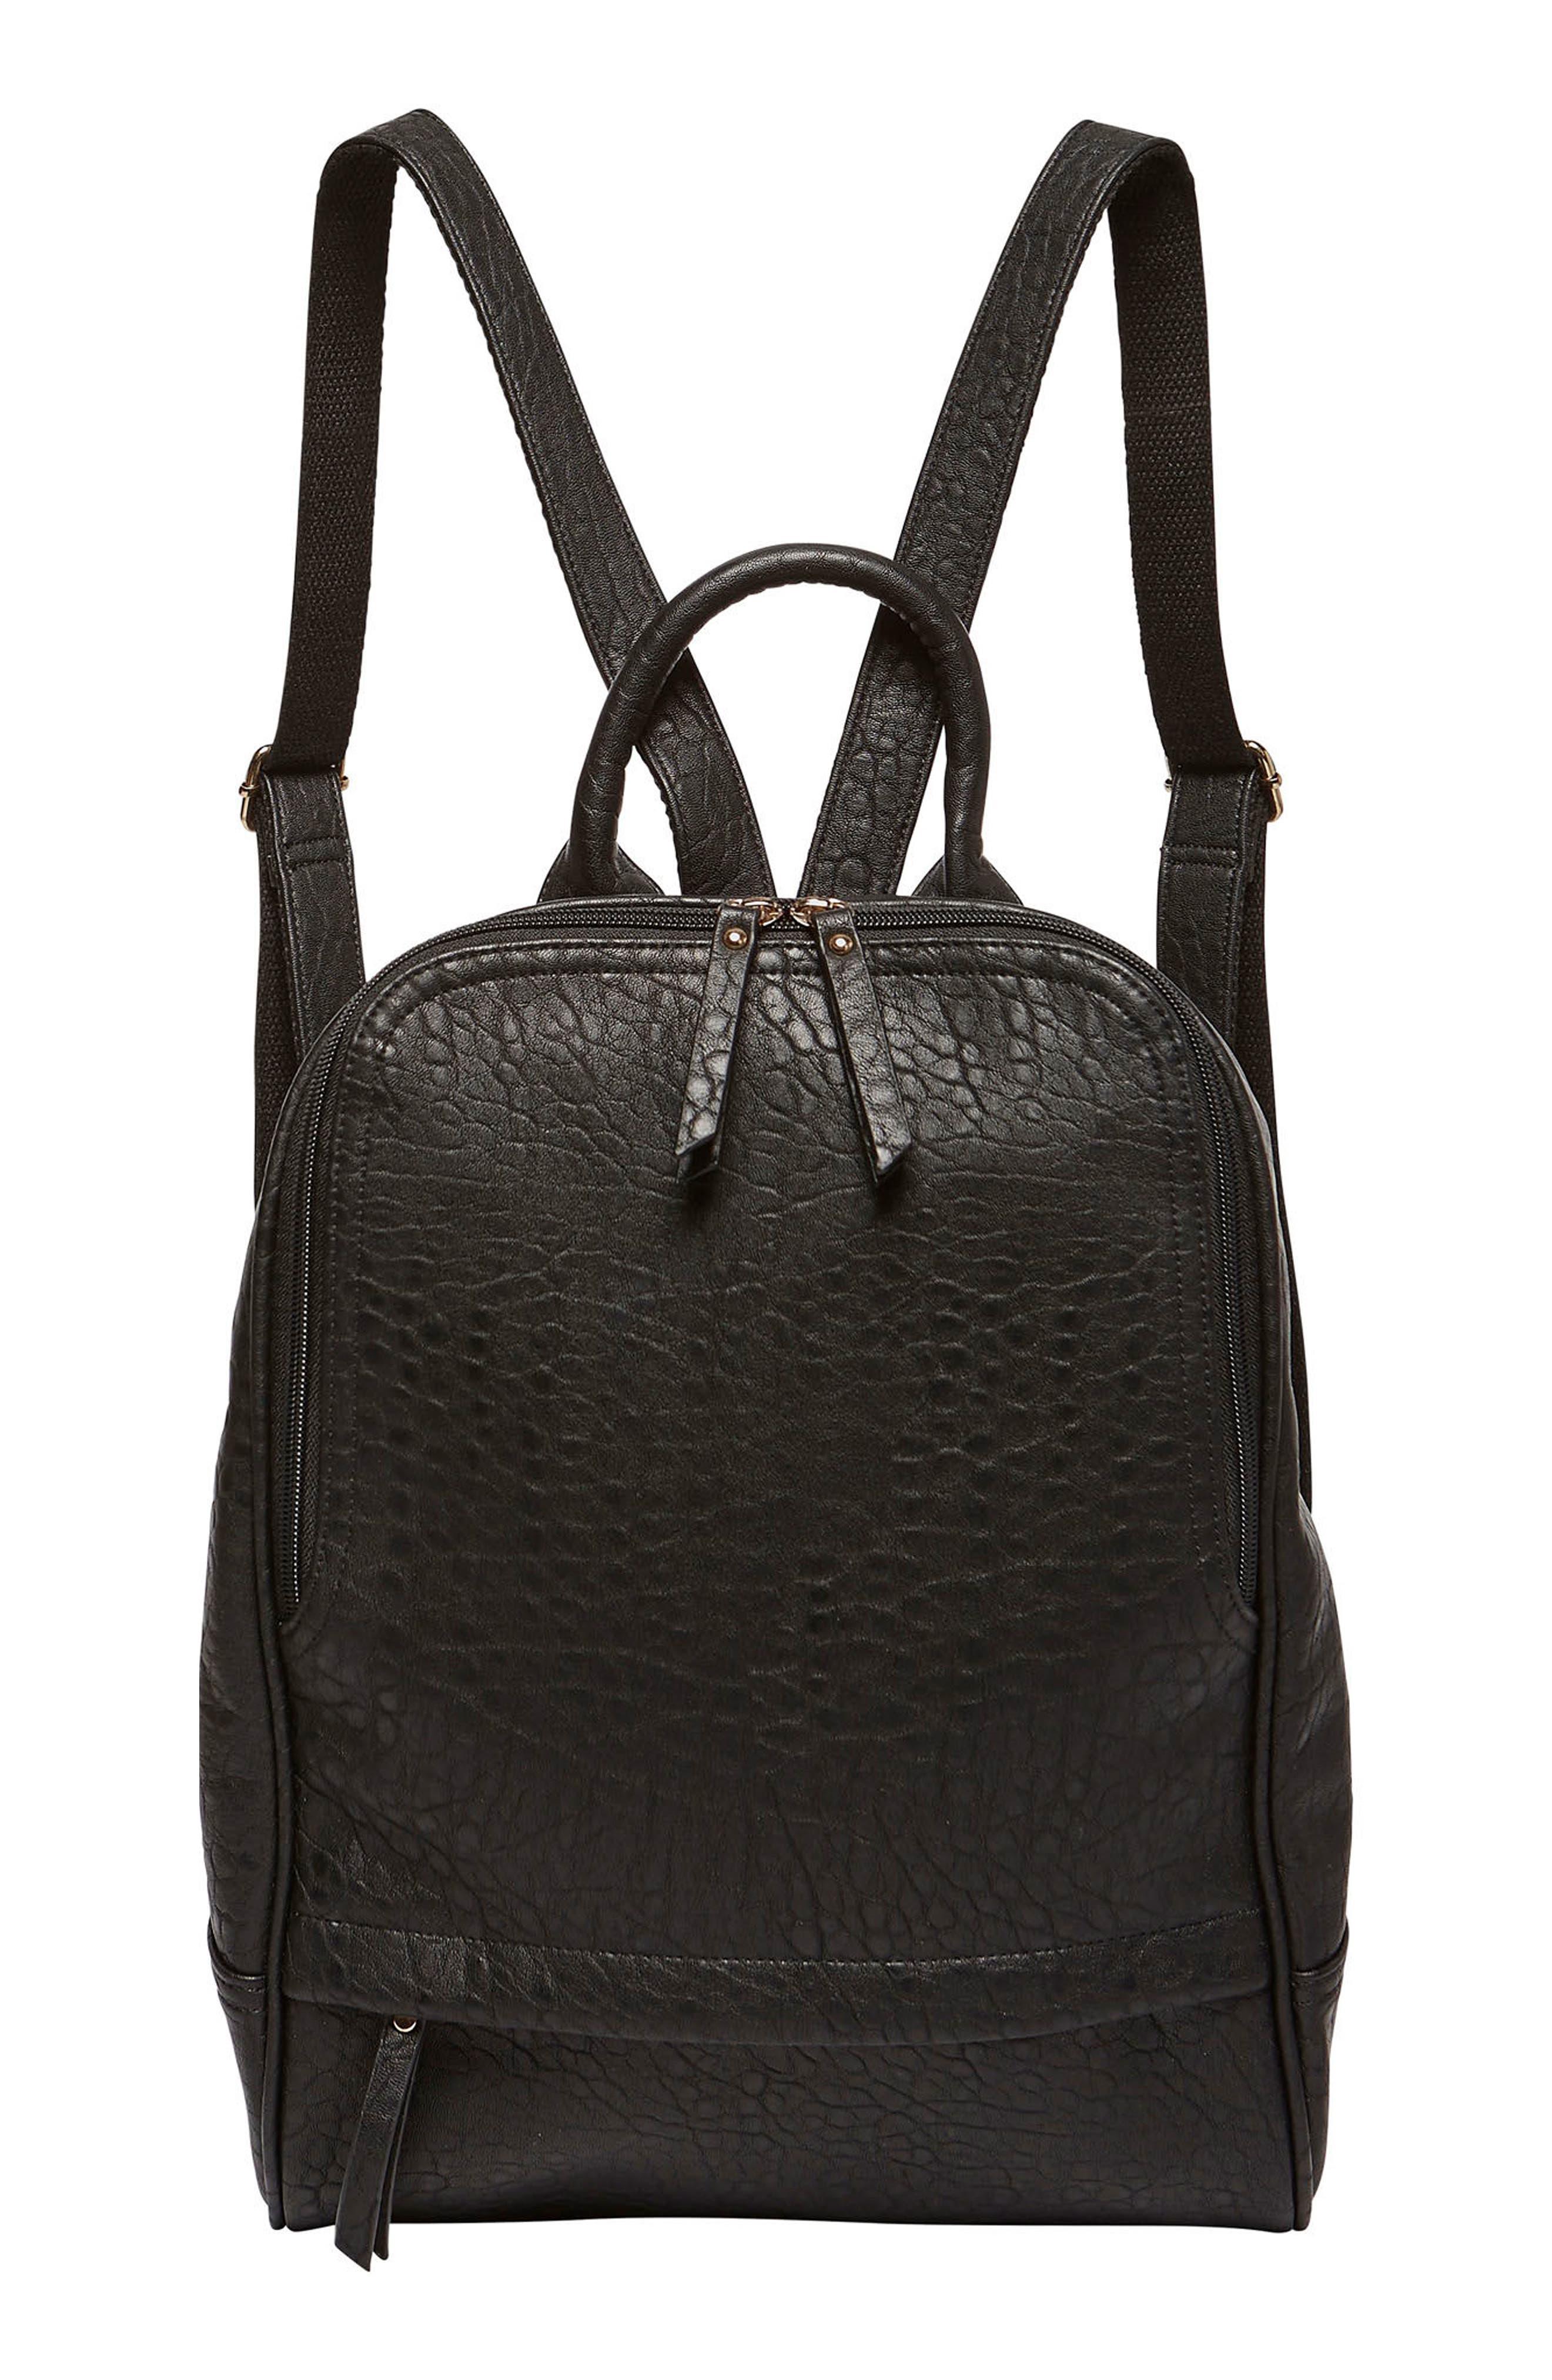 My Way Vegan Leather Backpack,                             Main thumbnail 1, color,                             Black